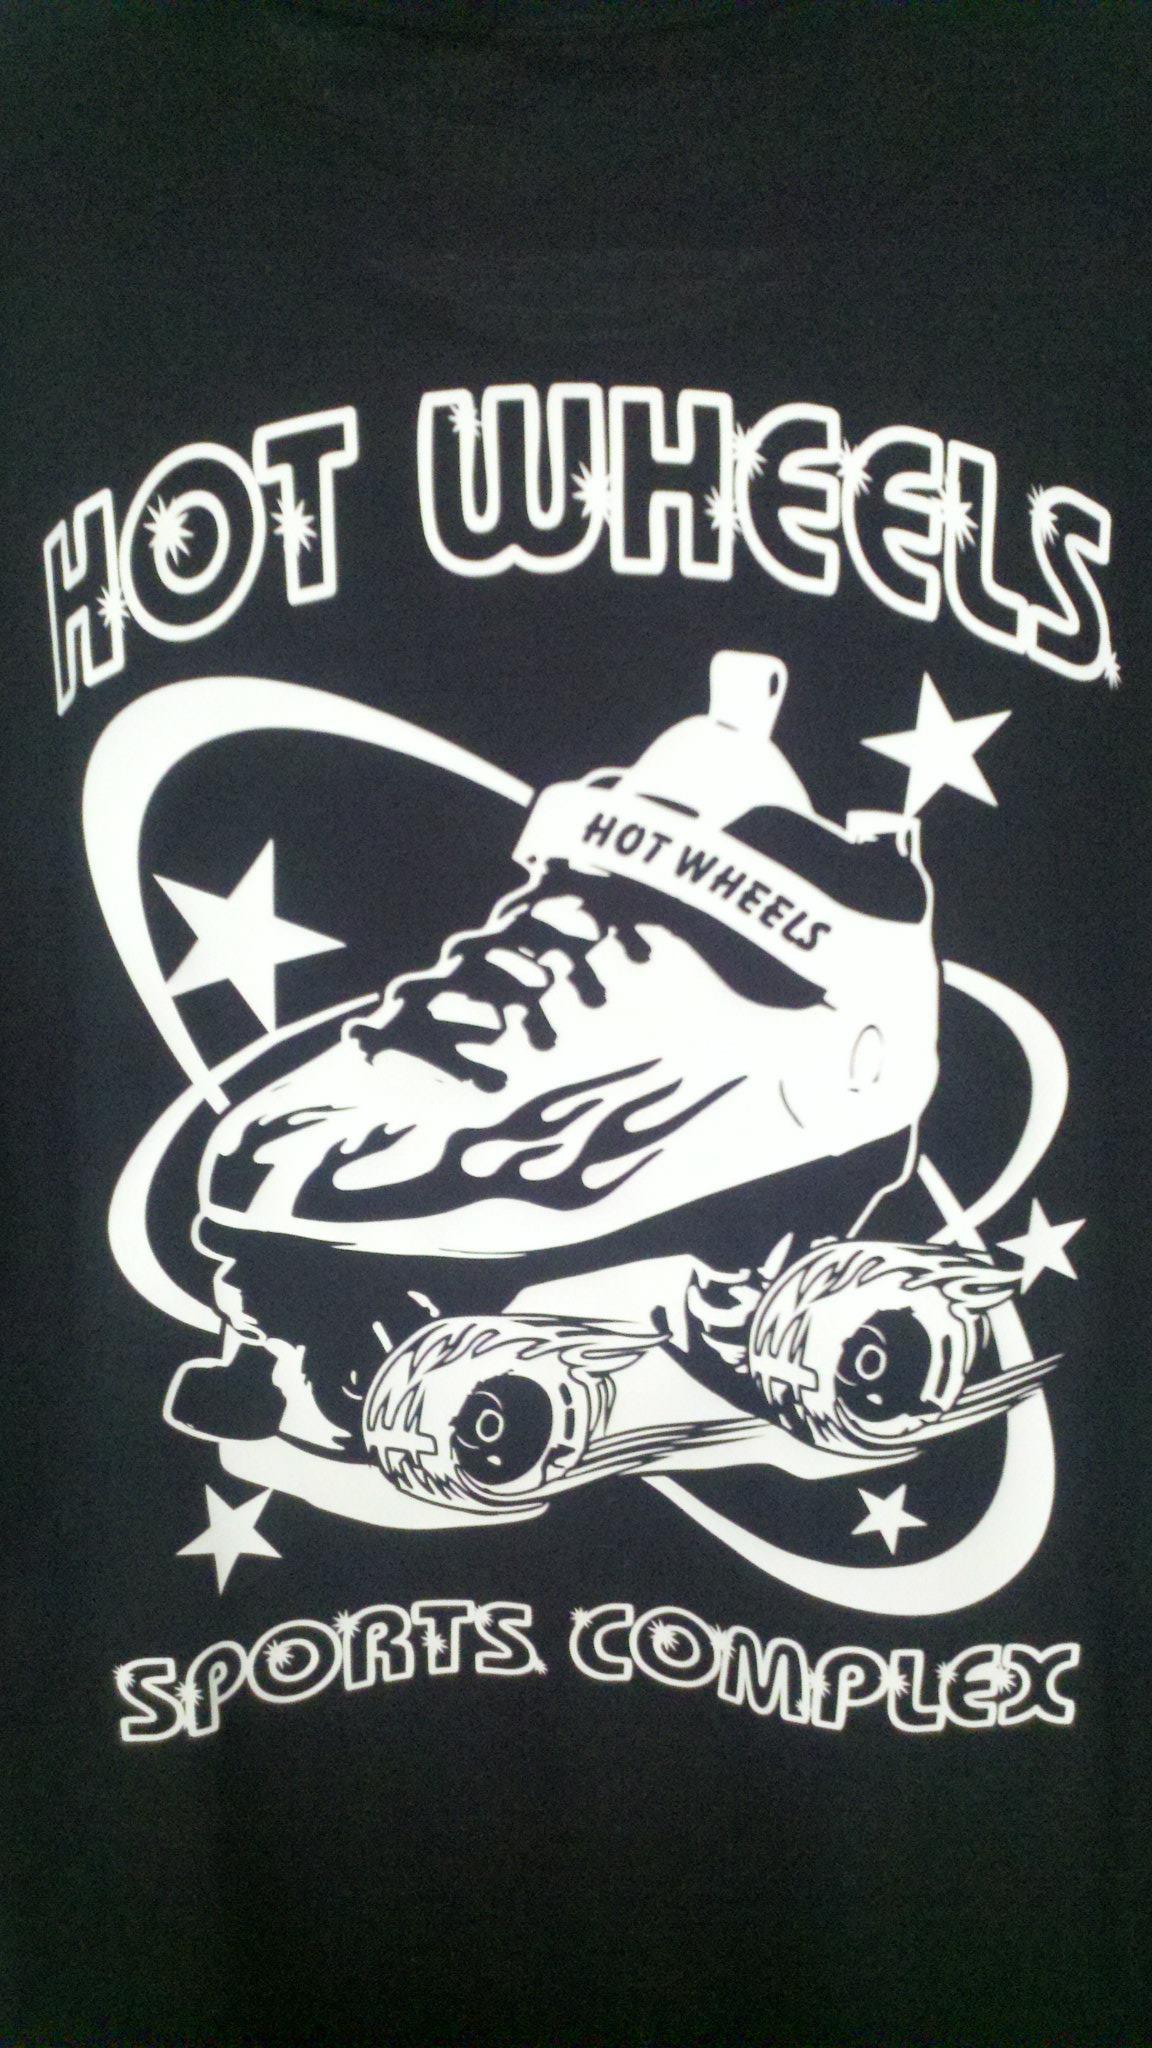 Hot Wheels Sports Complex